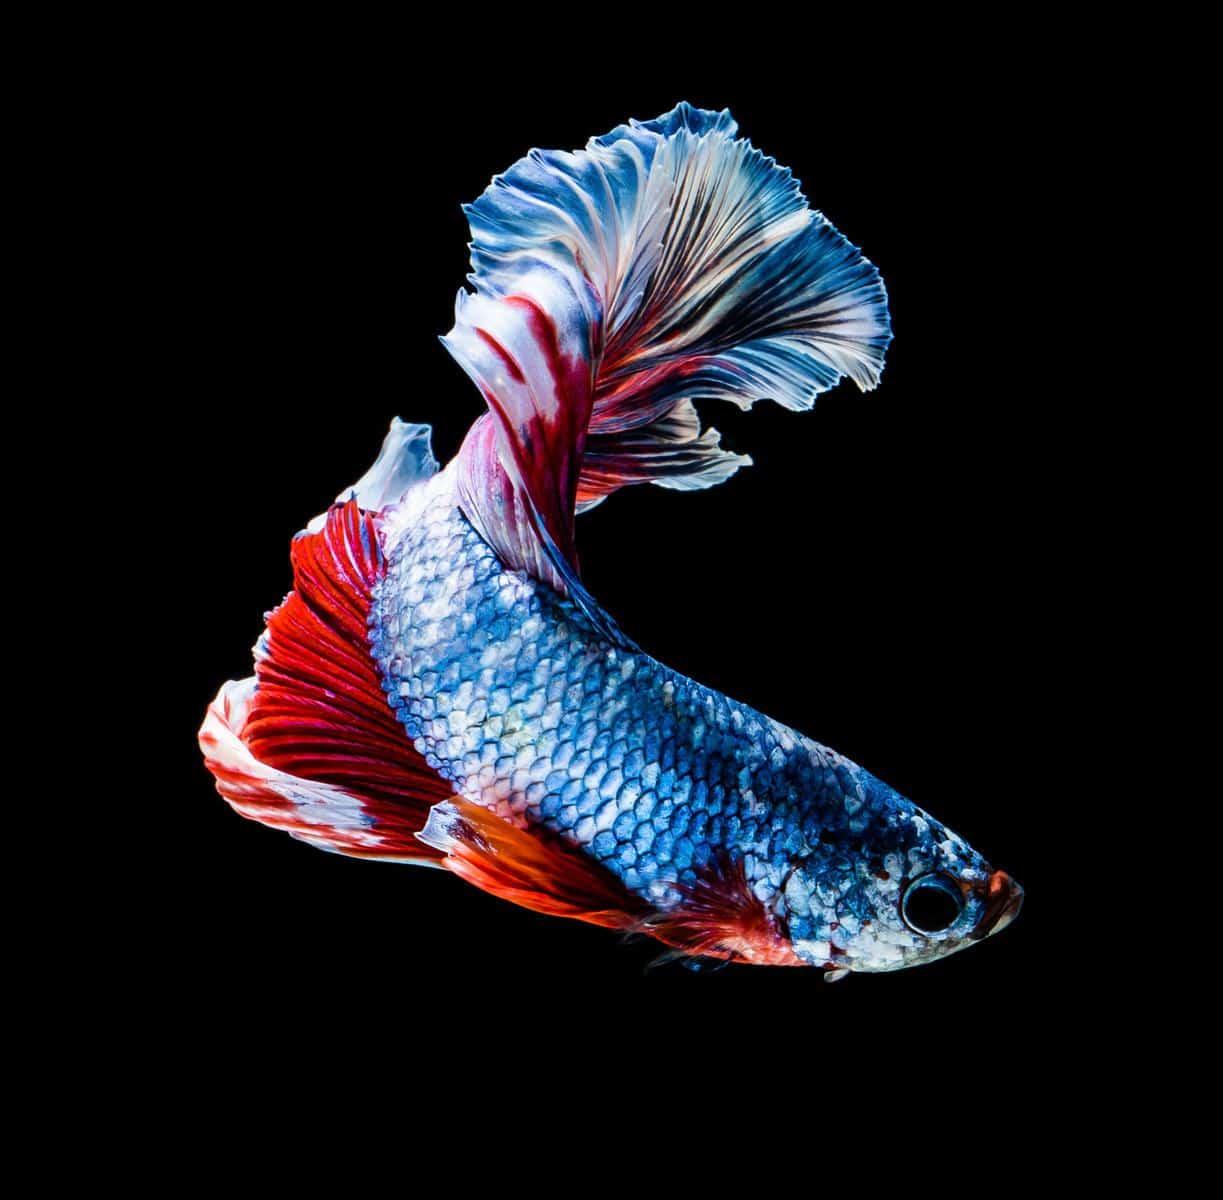 Betta Fish Swimming in Circles